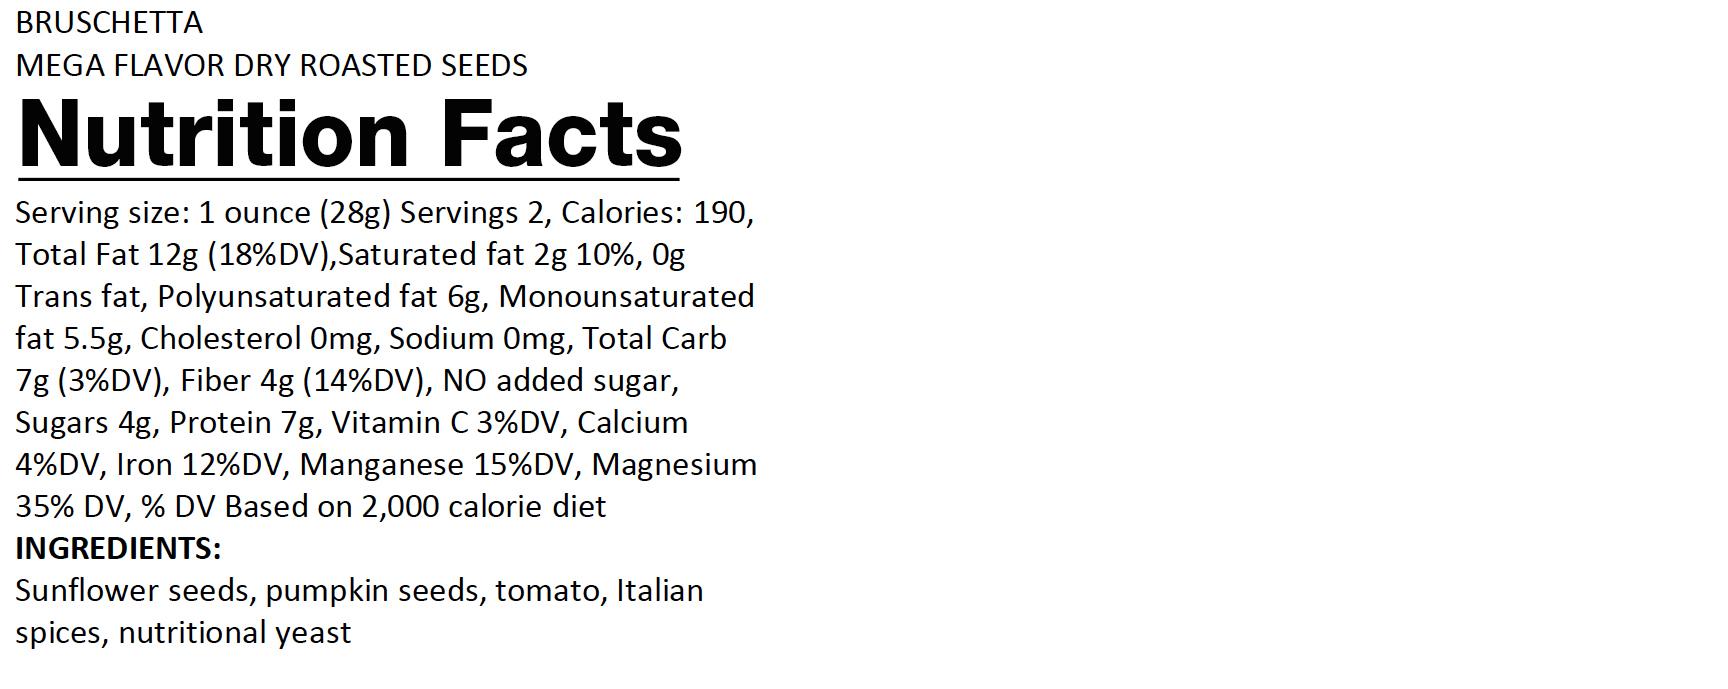 bruschetta-seeds-nut-facts.jpg